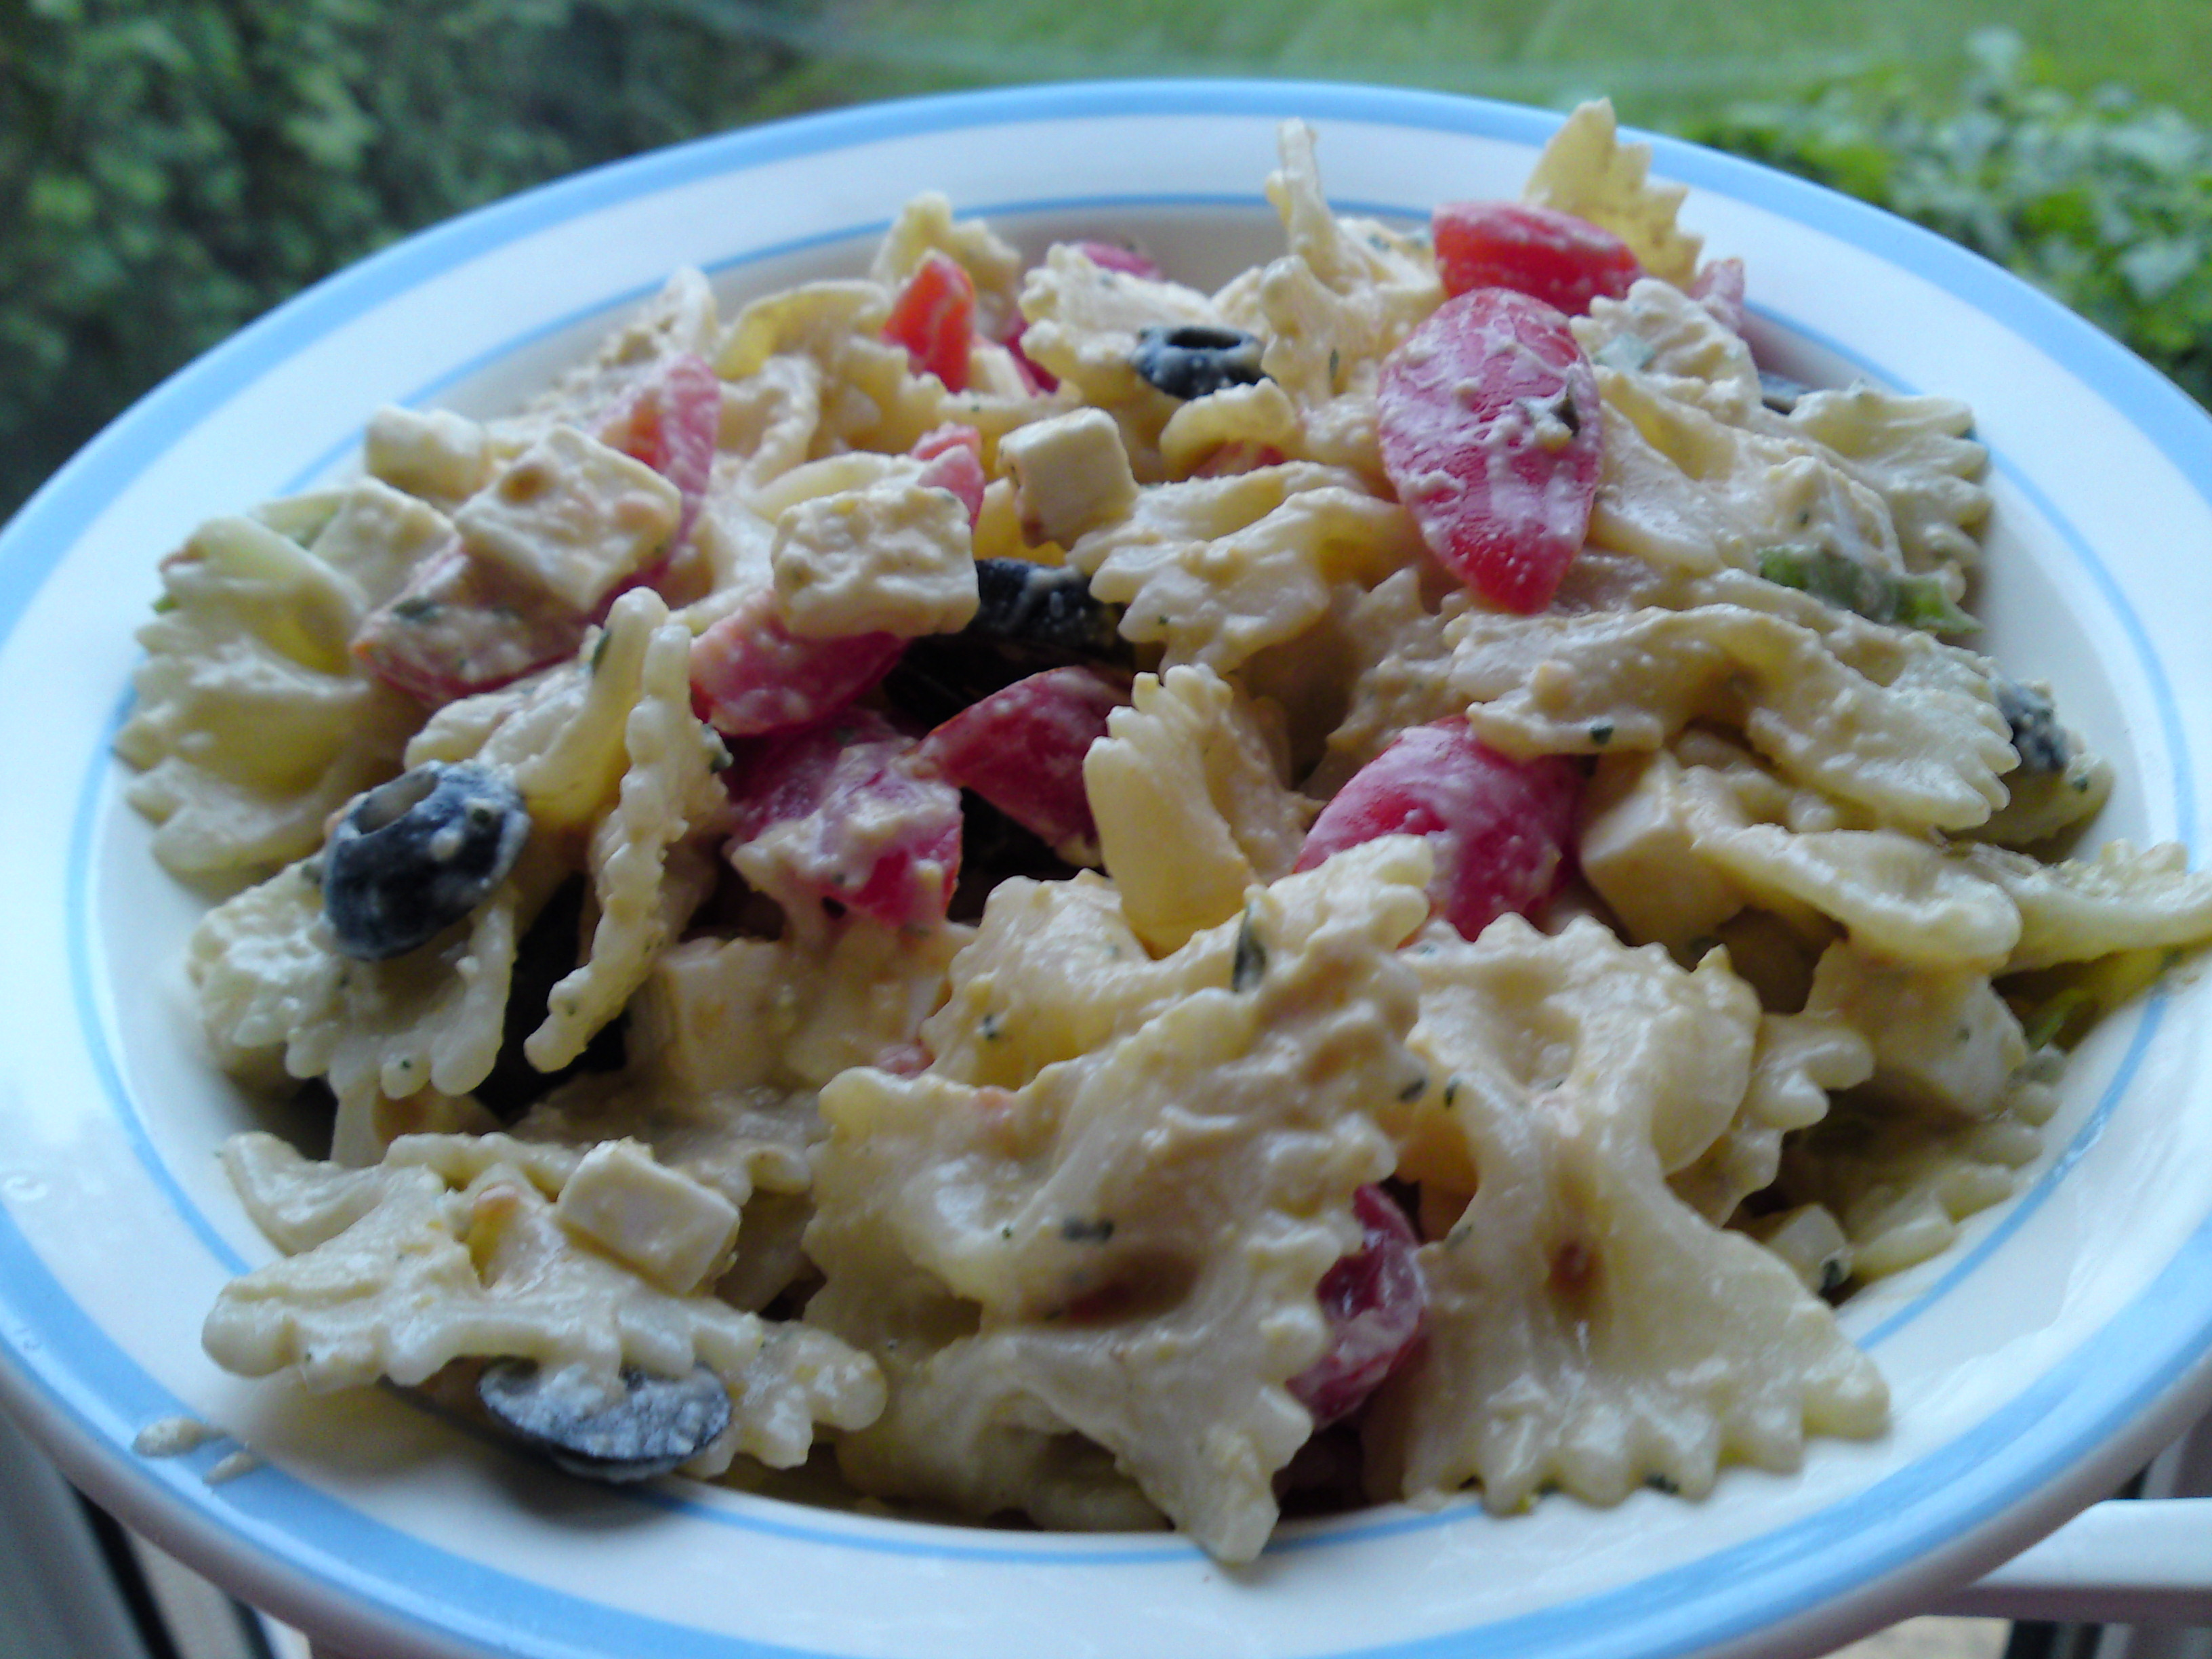 Penne salads recipes genius kitchen forumfinder Choice Image